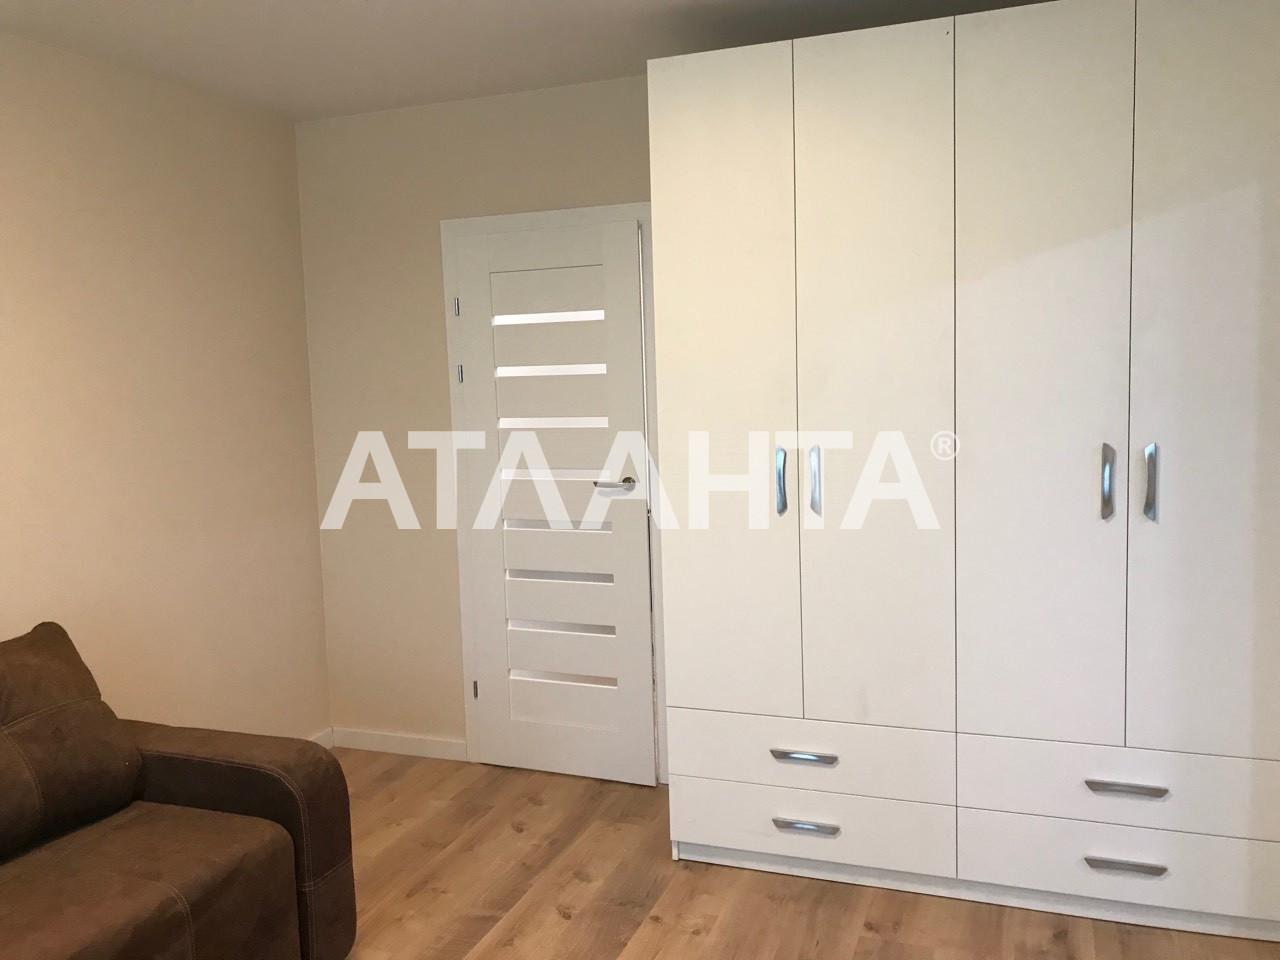 Продается 1-комнатная Квартира на ул. Ул. Ломоносова — 51 200 у.е. (фото №3)